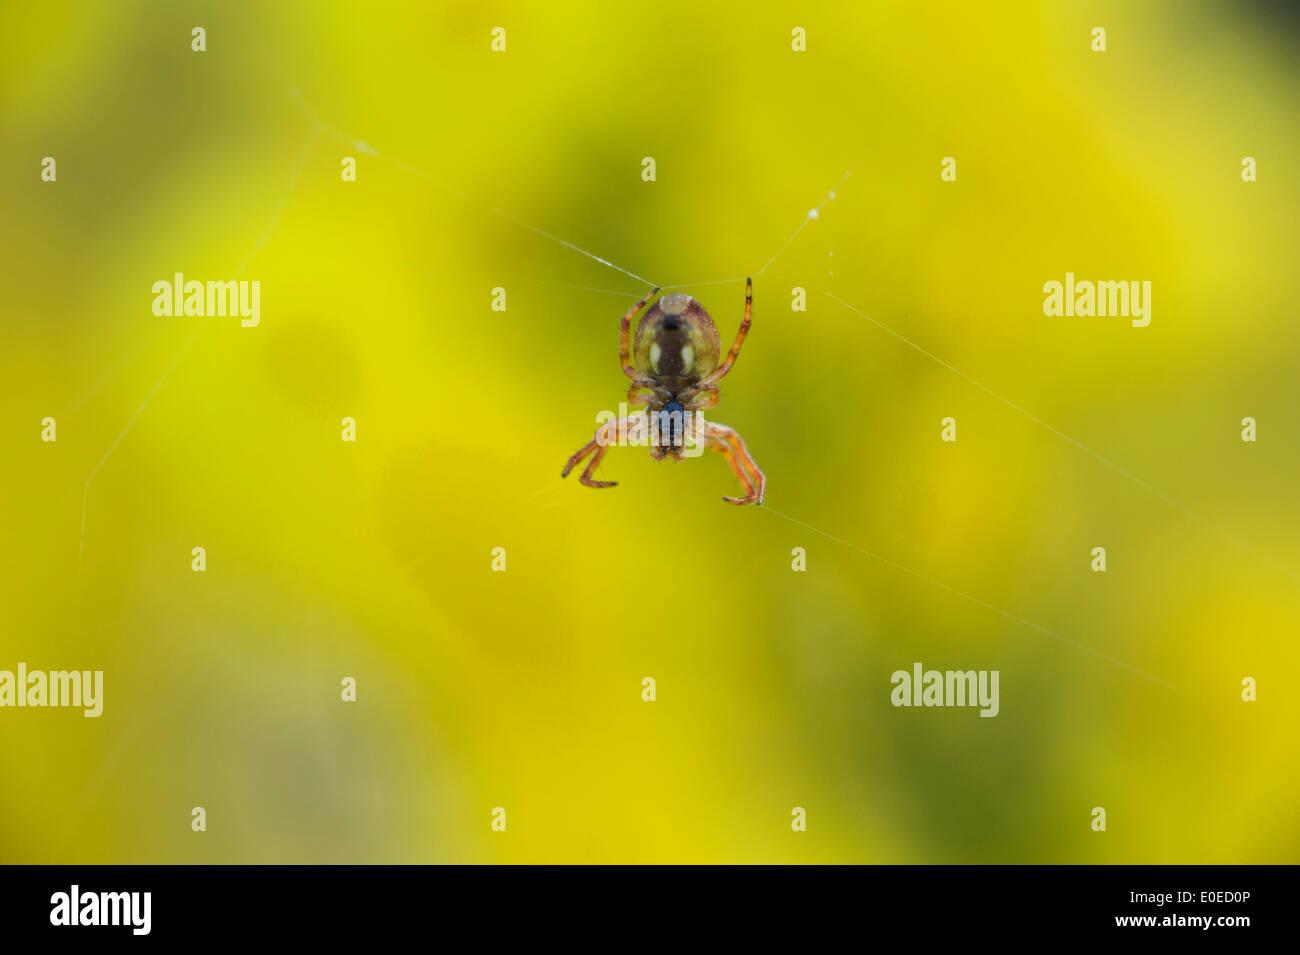 Cruceta en contra web fuera de foco amarillo de flores de acacia Imagen De Stock